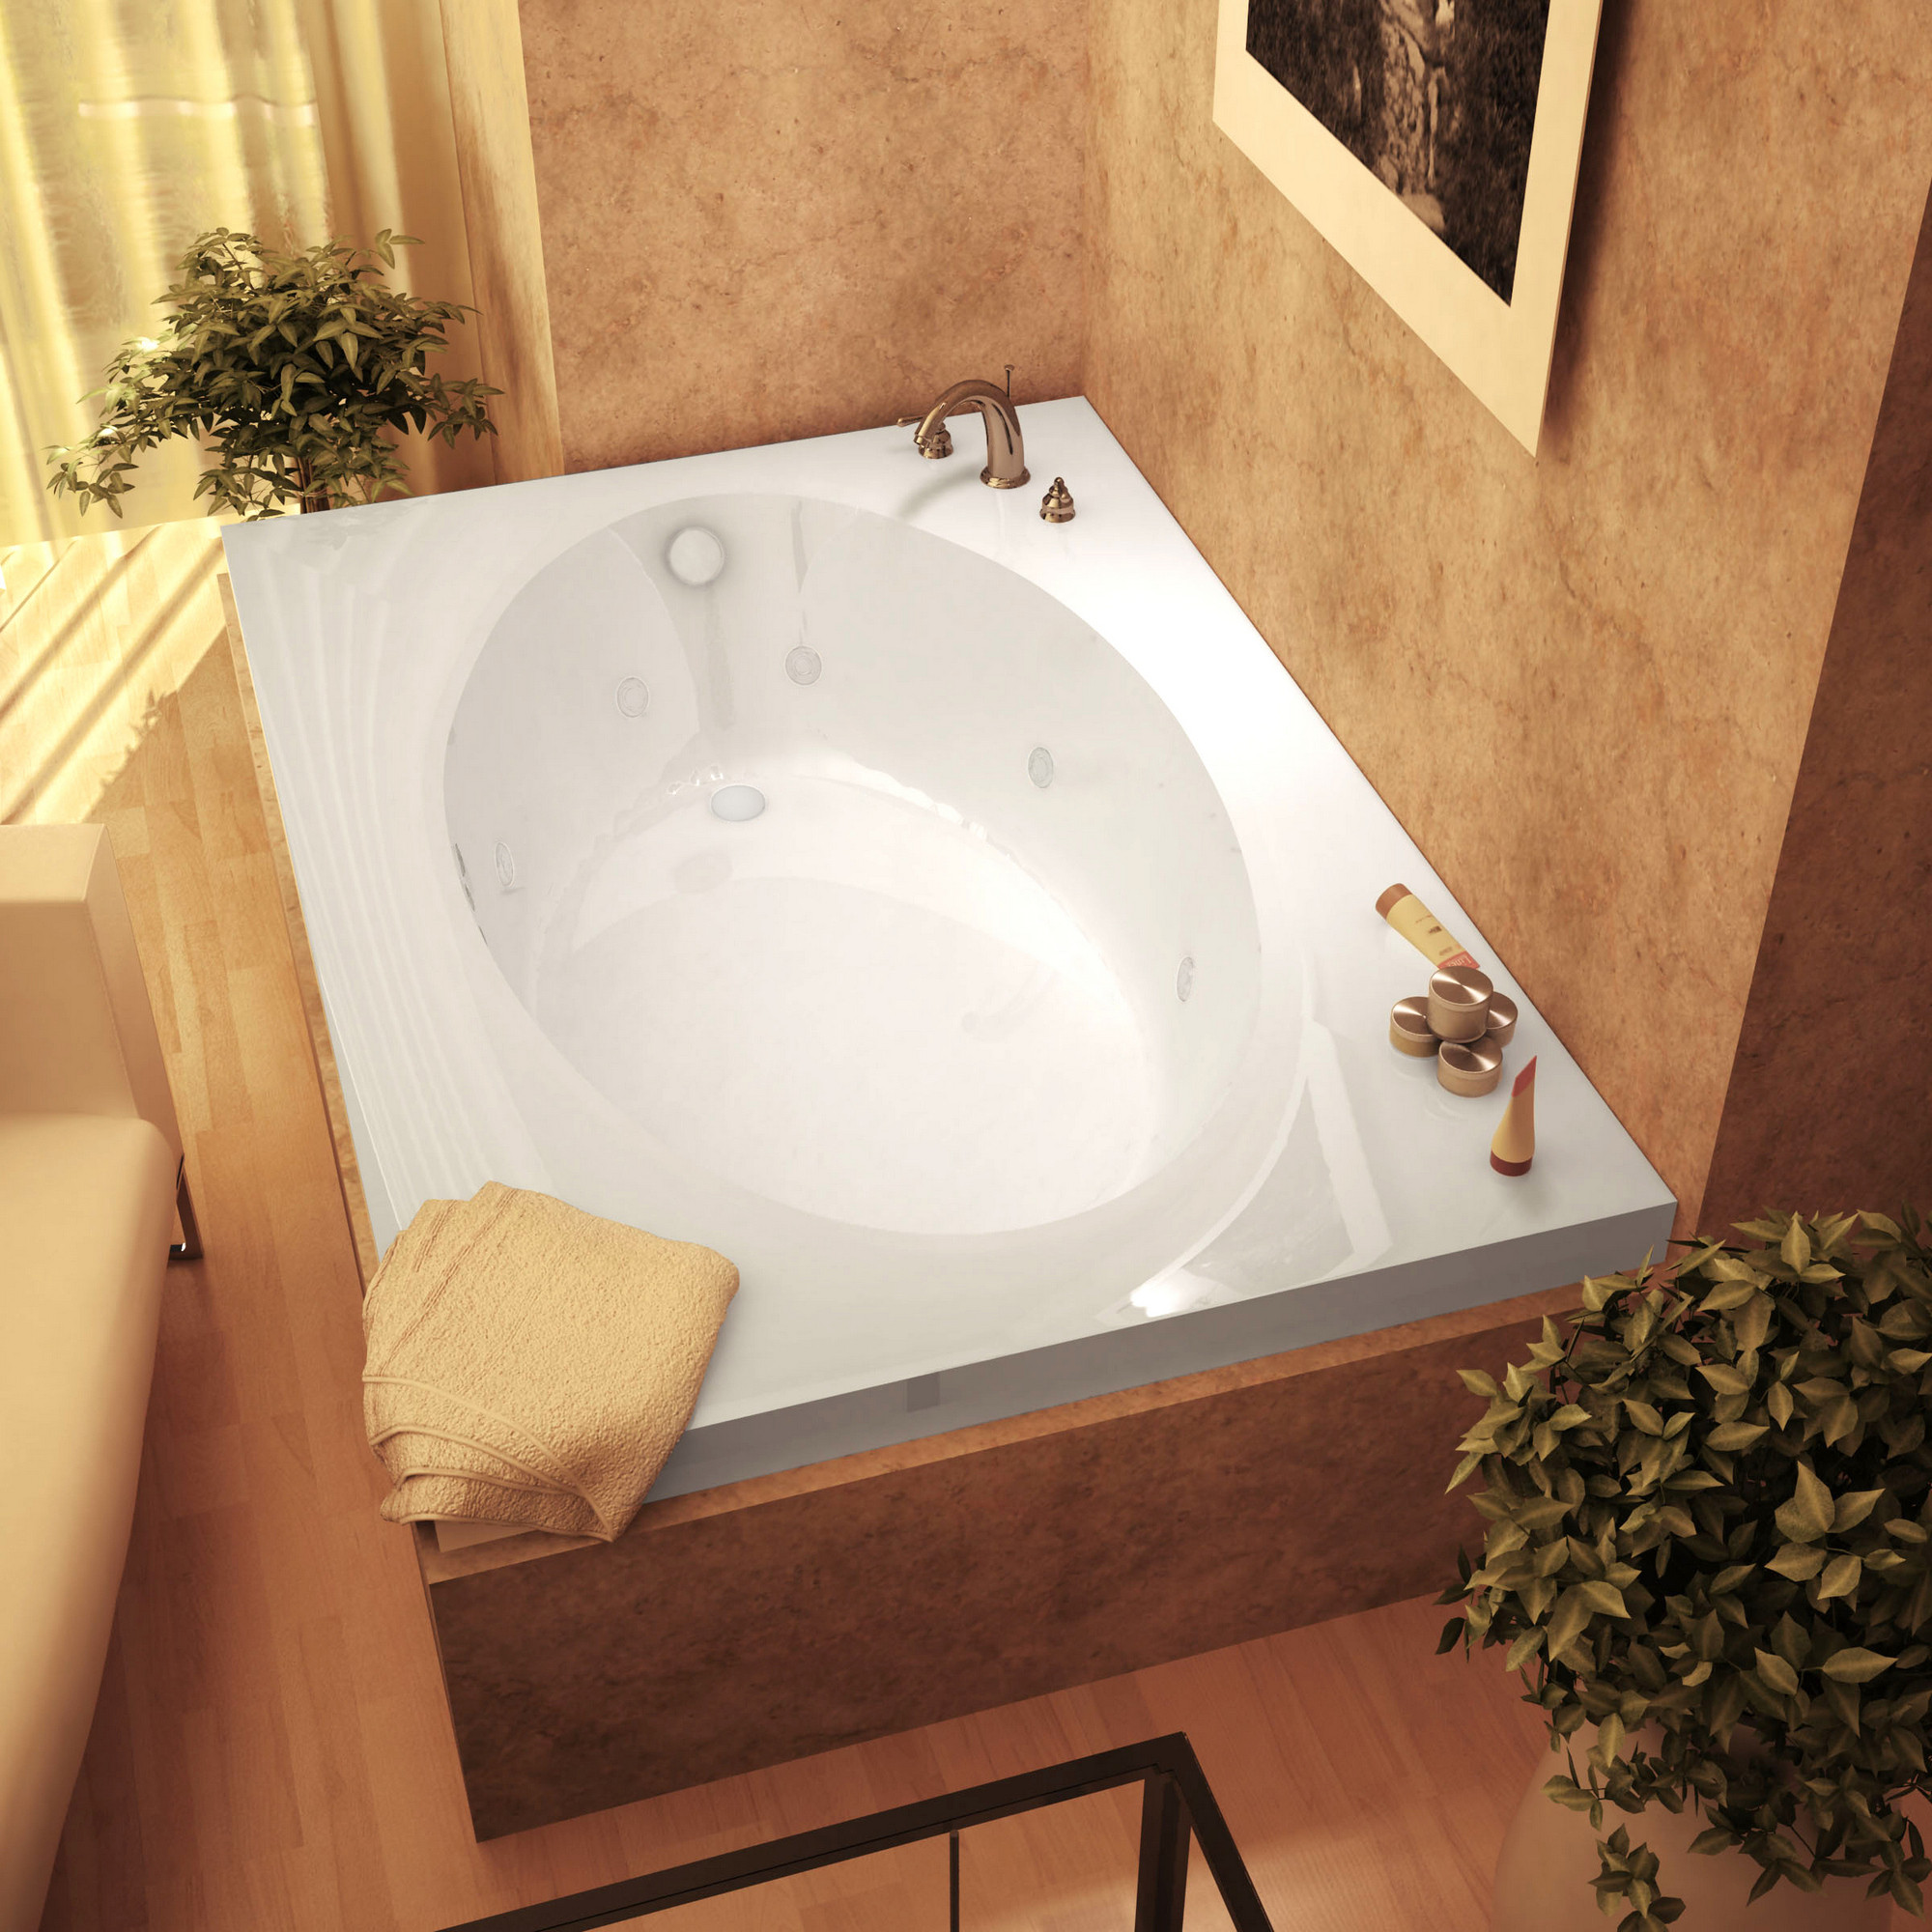 MediTub 4384VWL Atlantis Vogue Whirlpool Jetted Bathtub With Left Drain